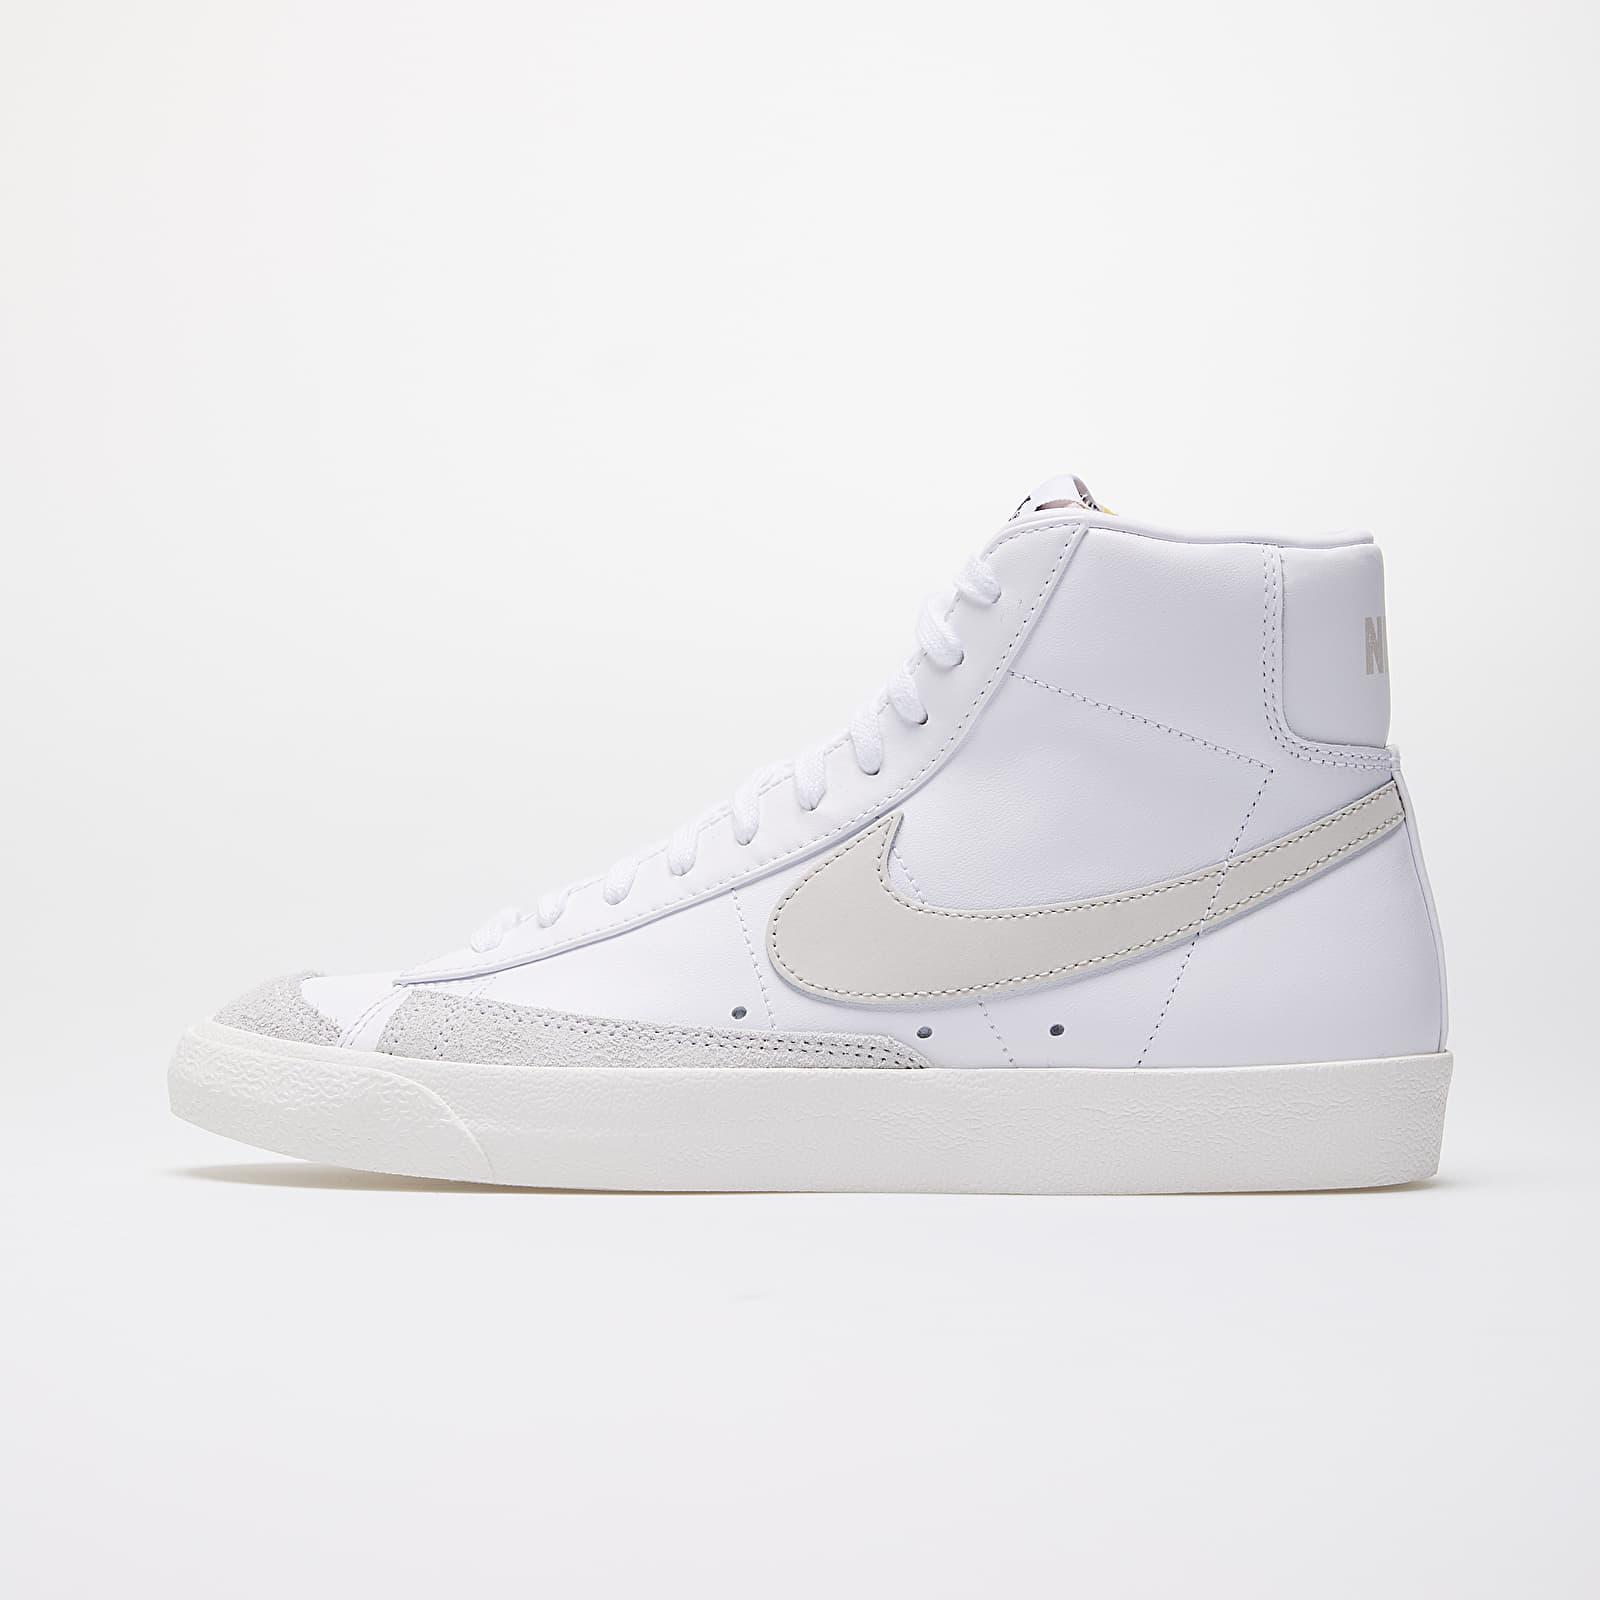 Pánské tenisky a boty Nike Blazer Mid '77 Vintage White/ Light Bone-Sail